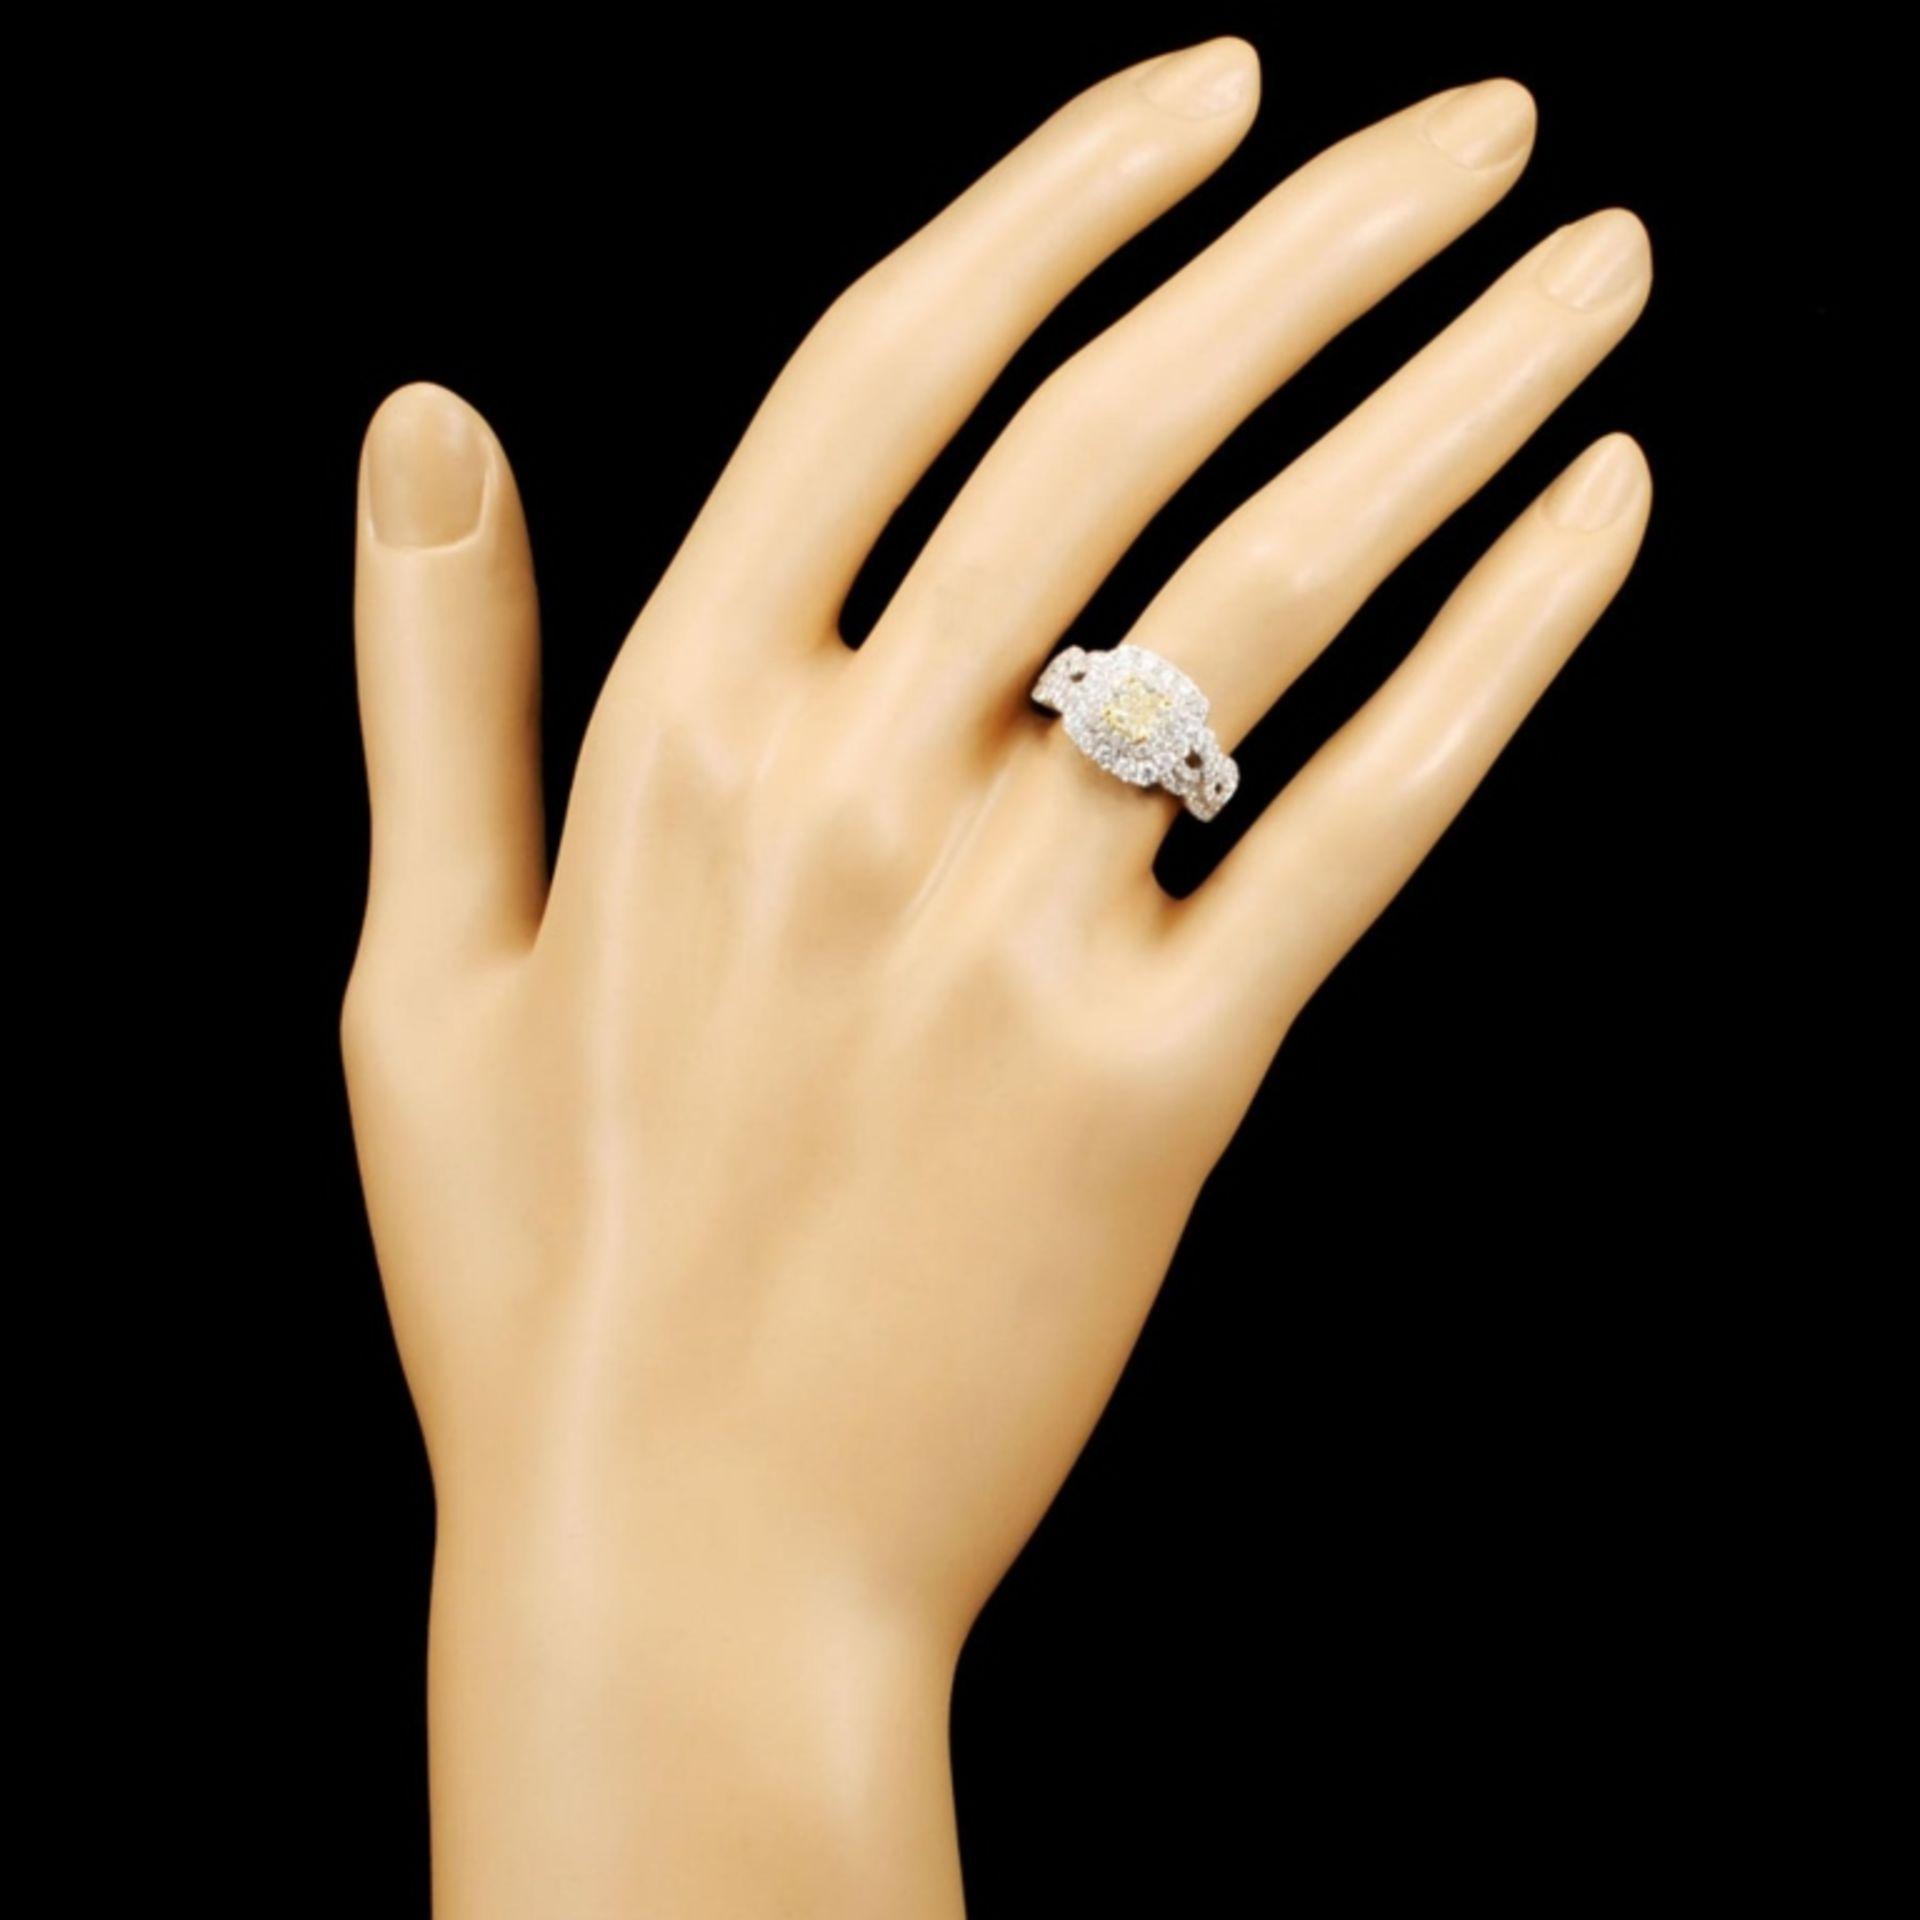 18K Gold 1.52ctw Fancy Diamond Ring - Image 4 of 5